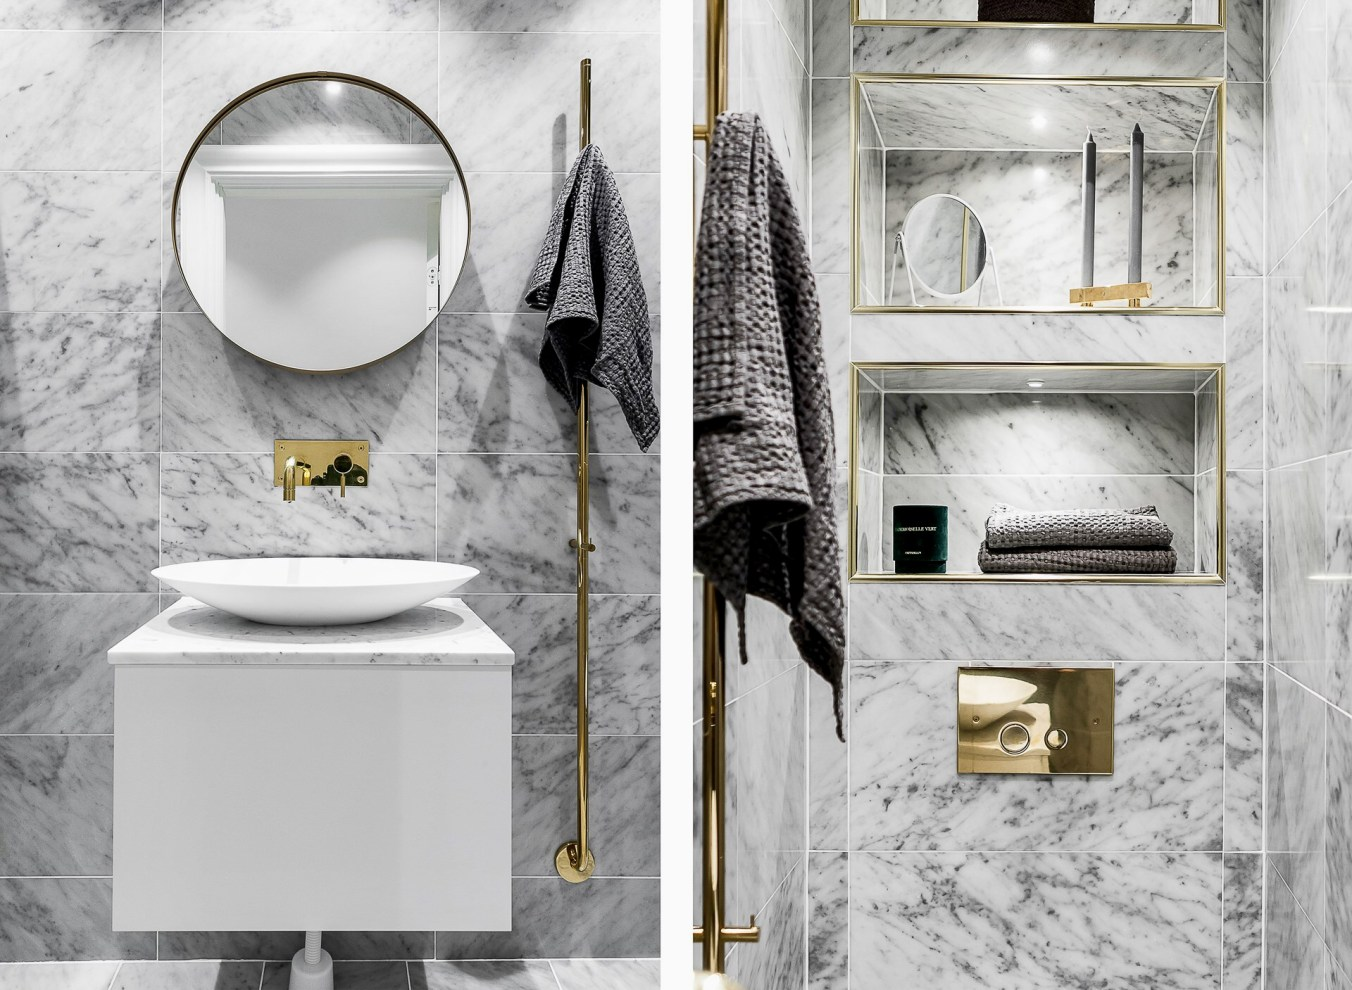 ванная комната раковина санузел зеркало